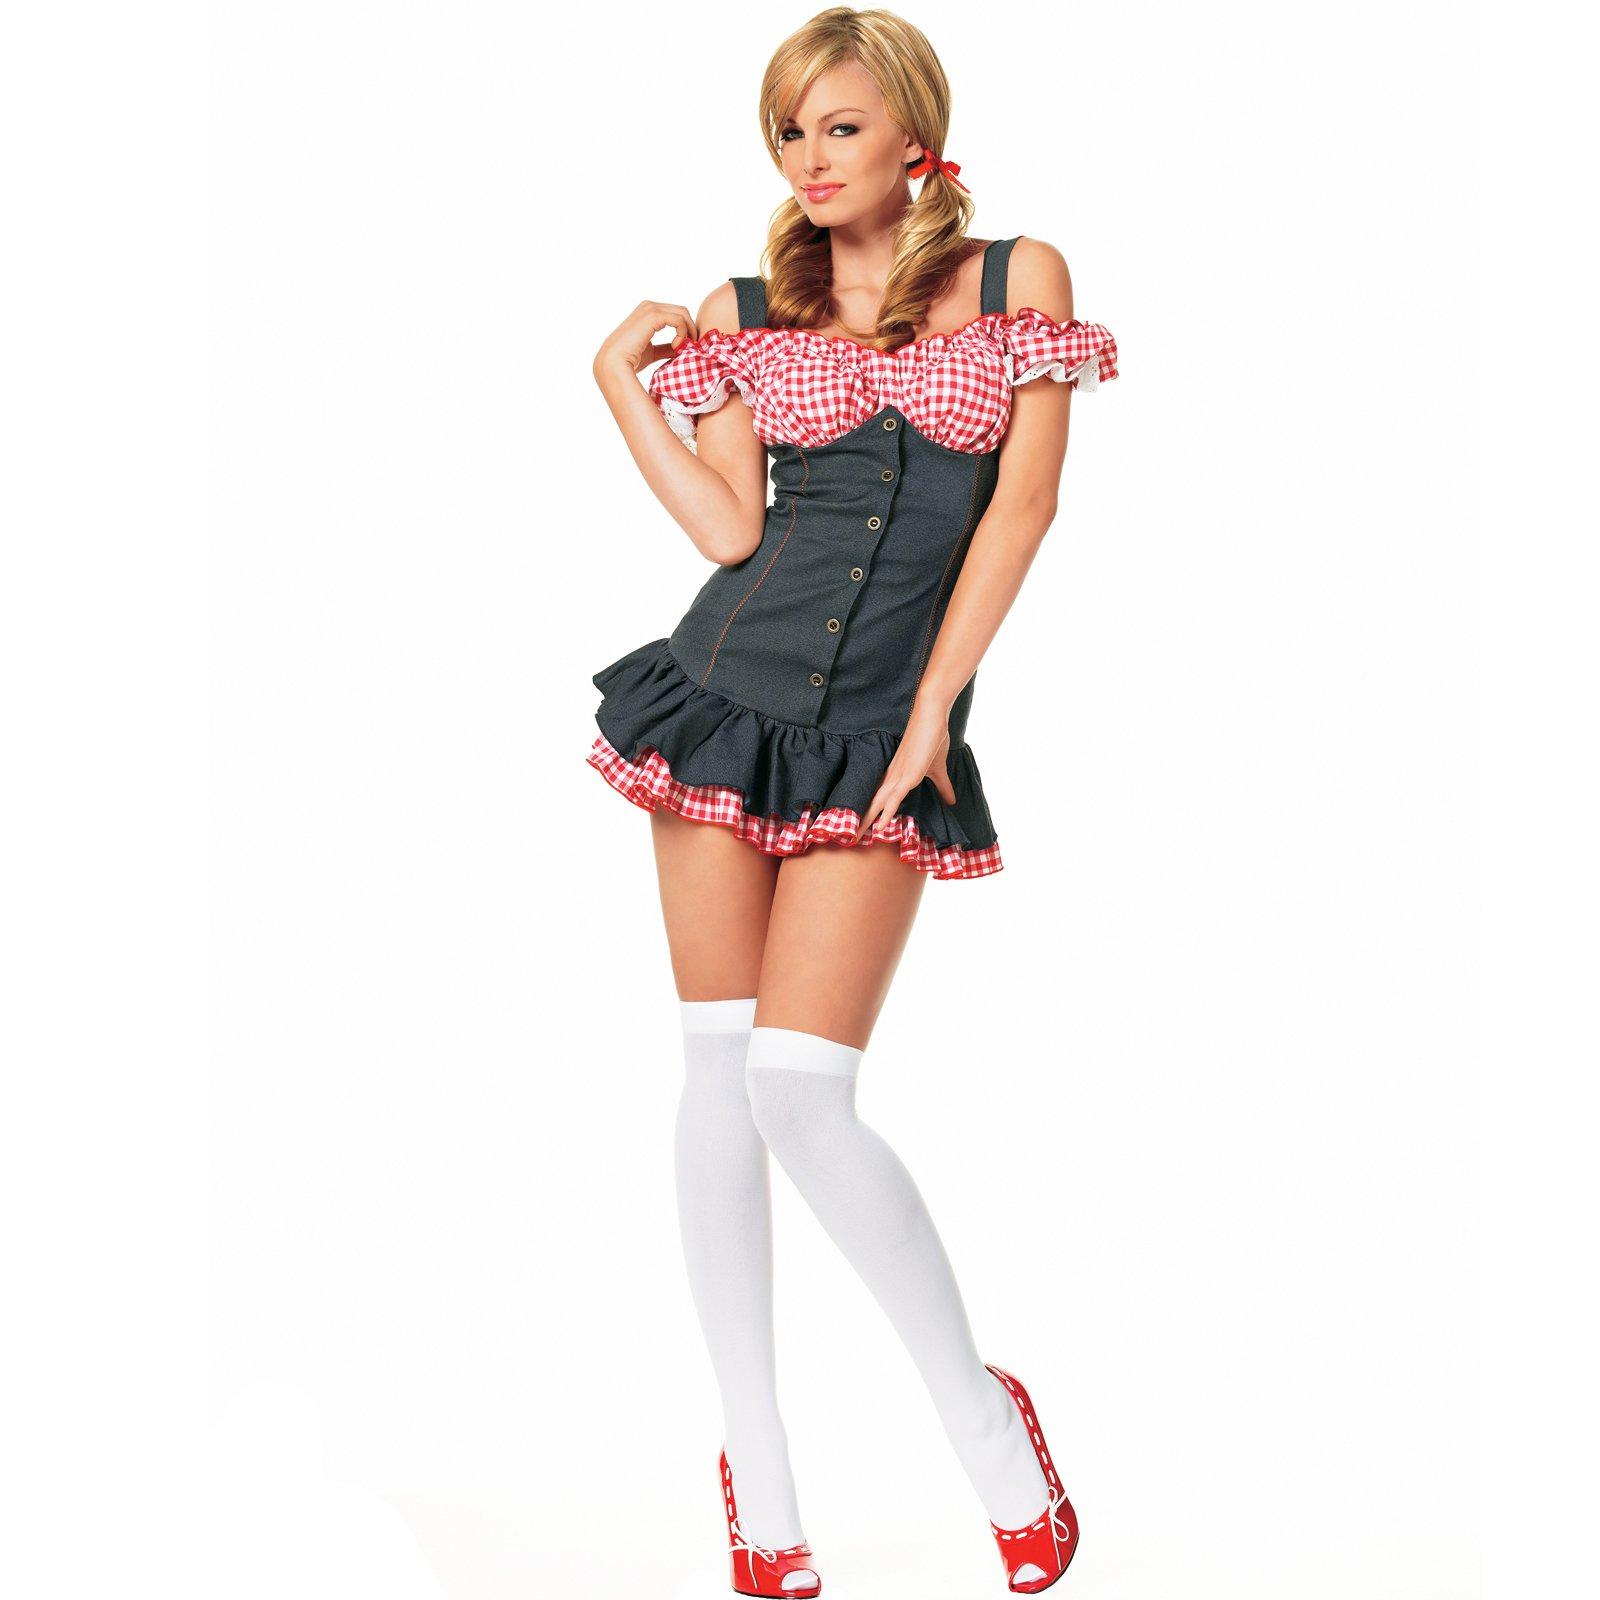 Фото костюм на хэллоуин письки 7 фотография